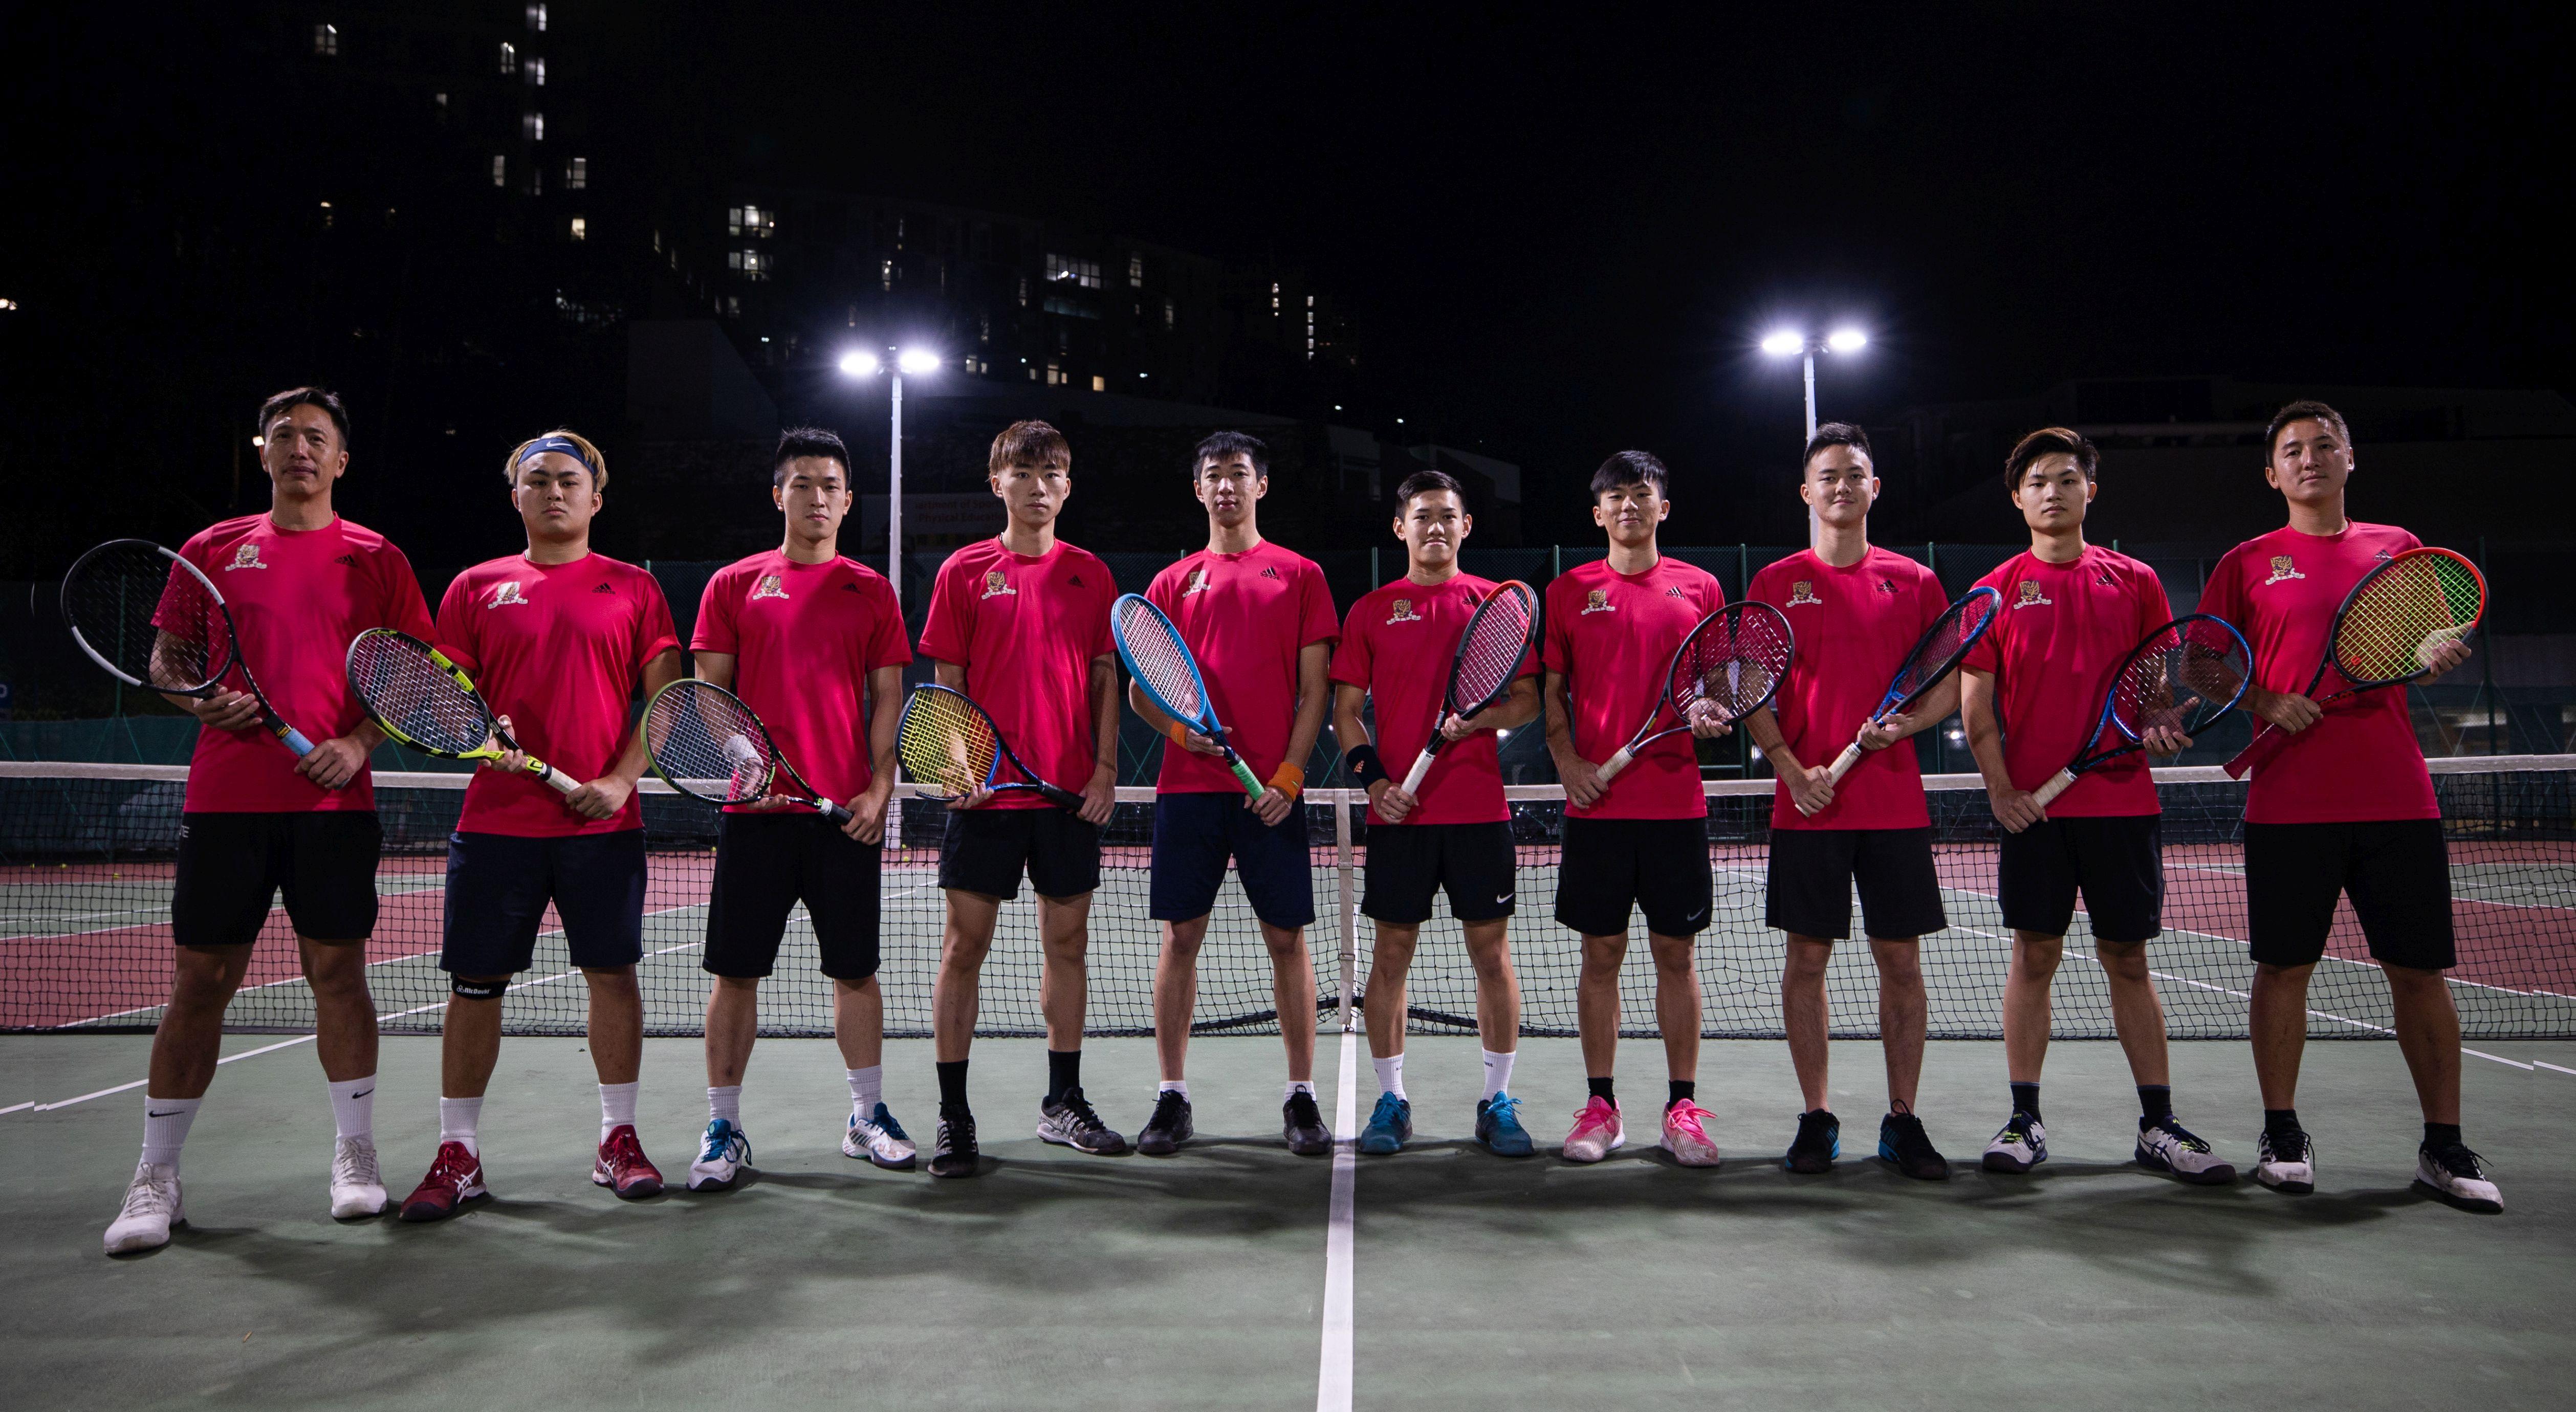 Tennis boys 2019 2020